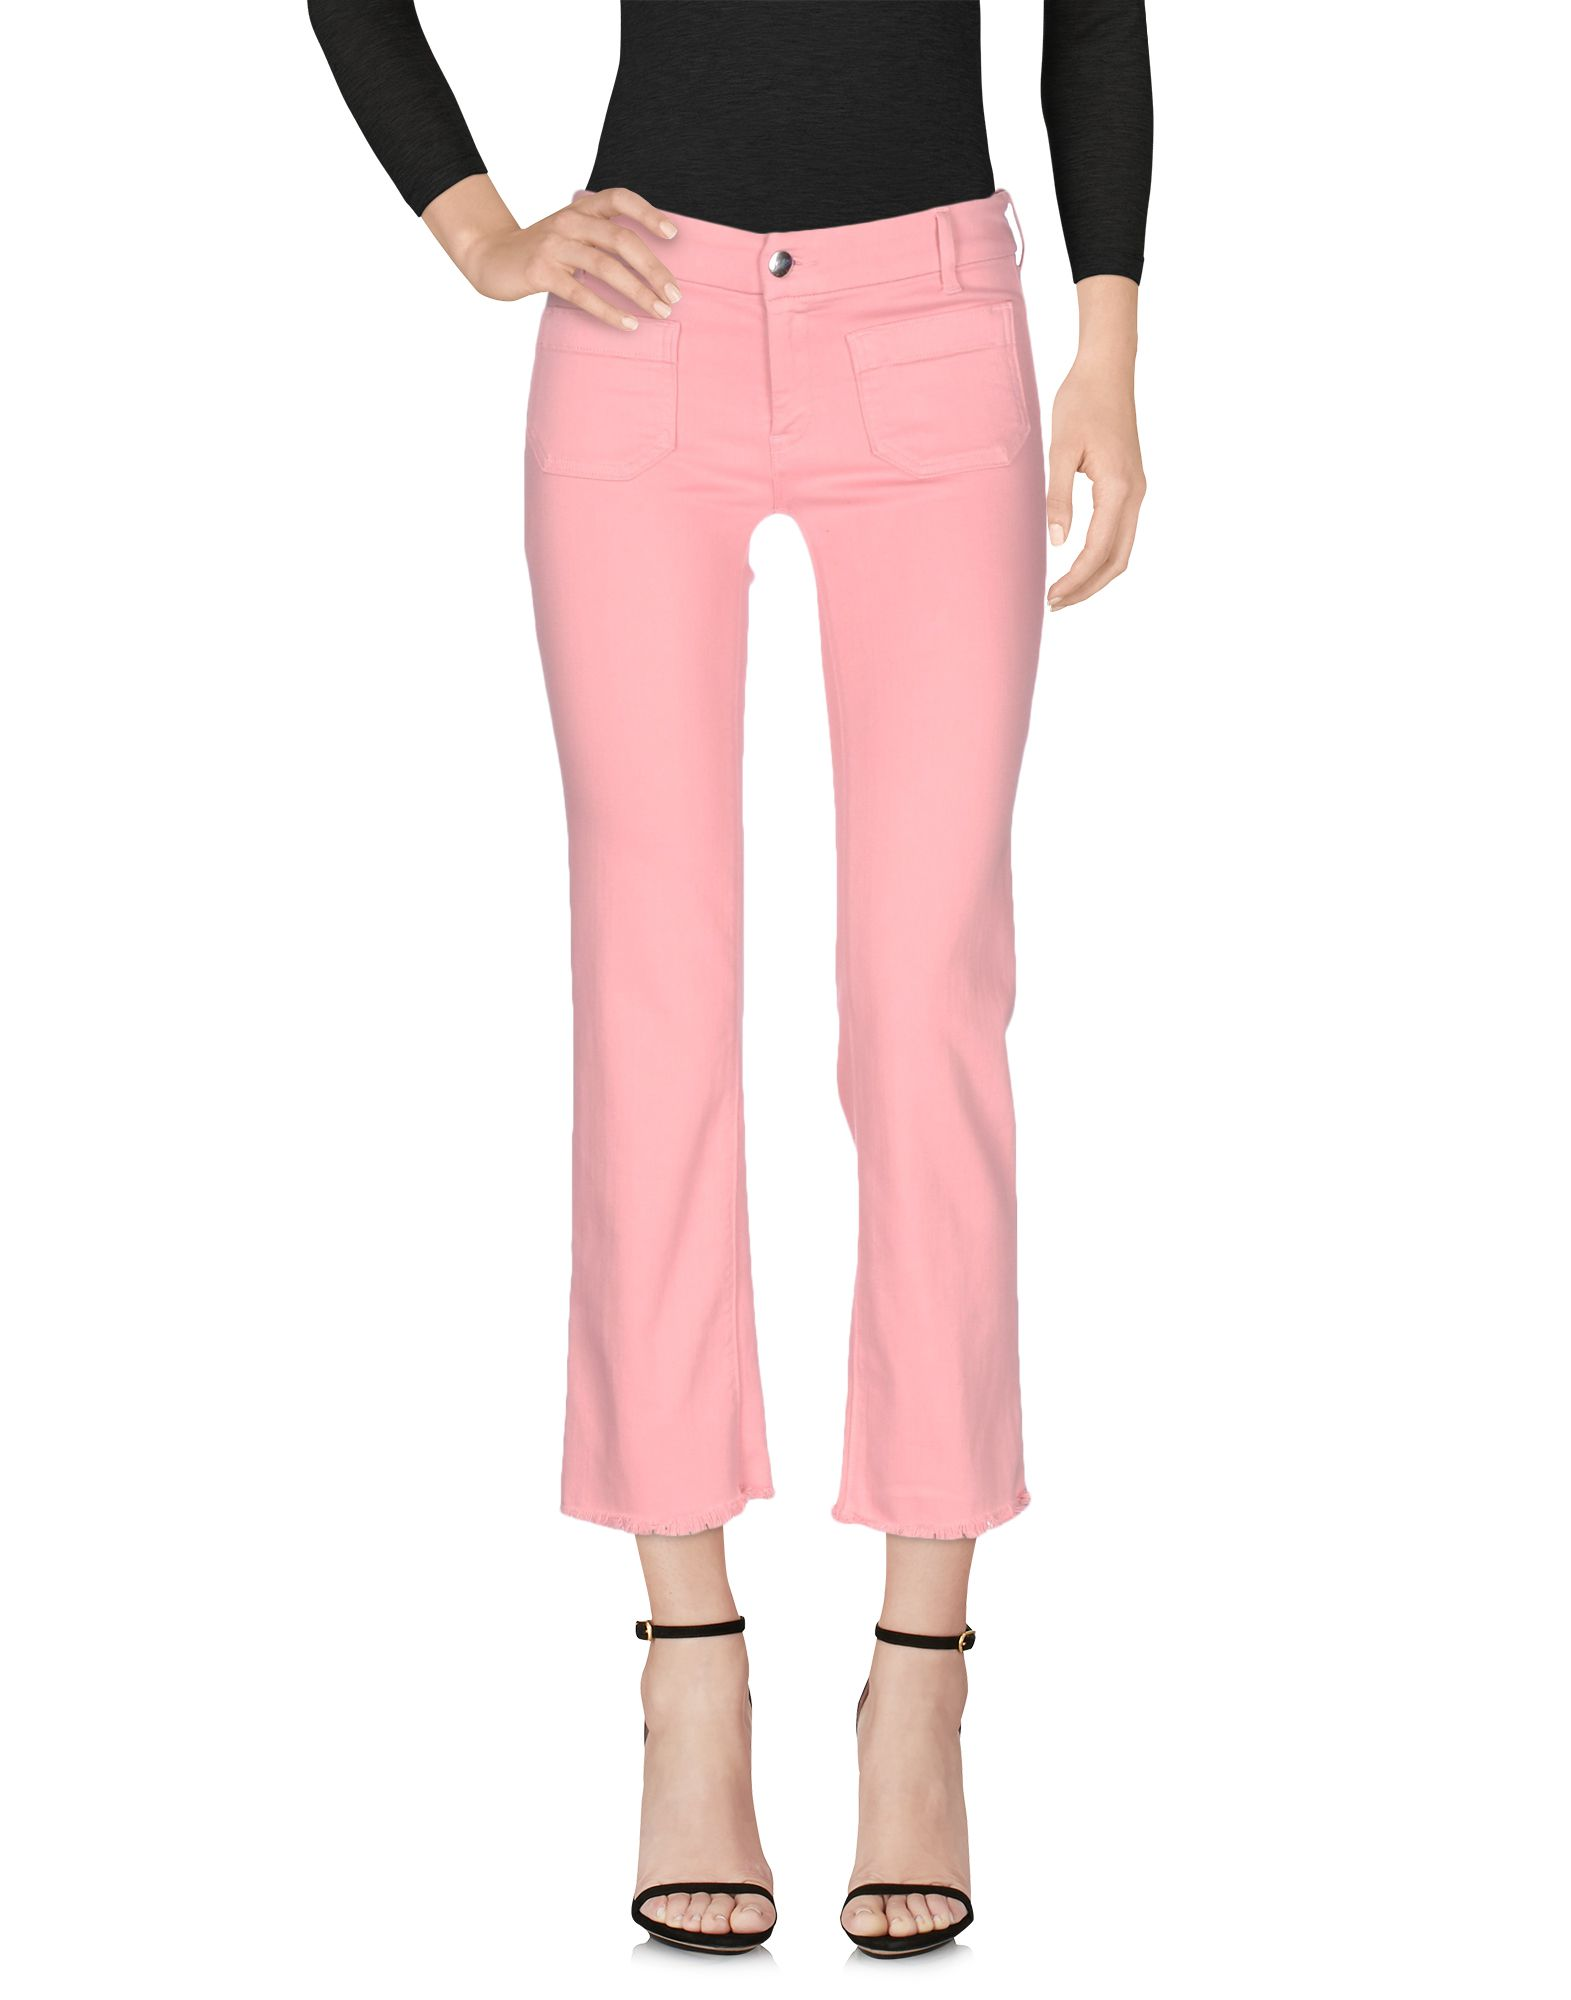 the great джинсовые брюки THE SEAFARER Джинсовые брюки